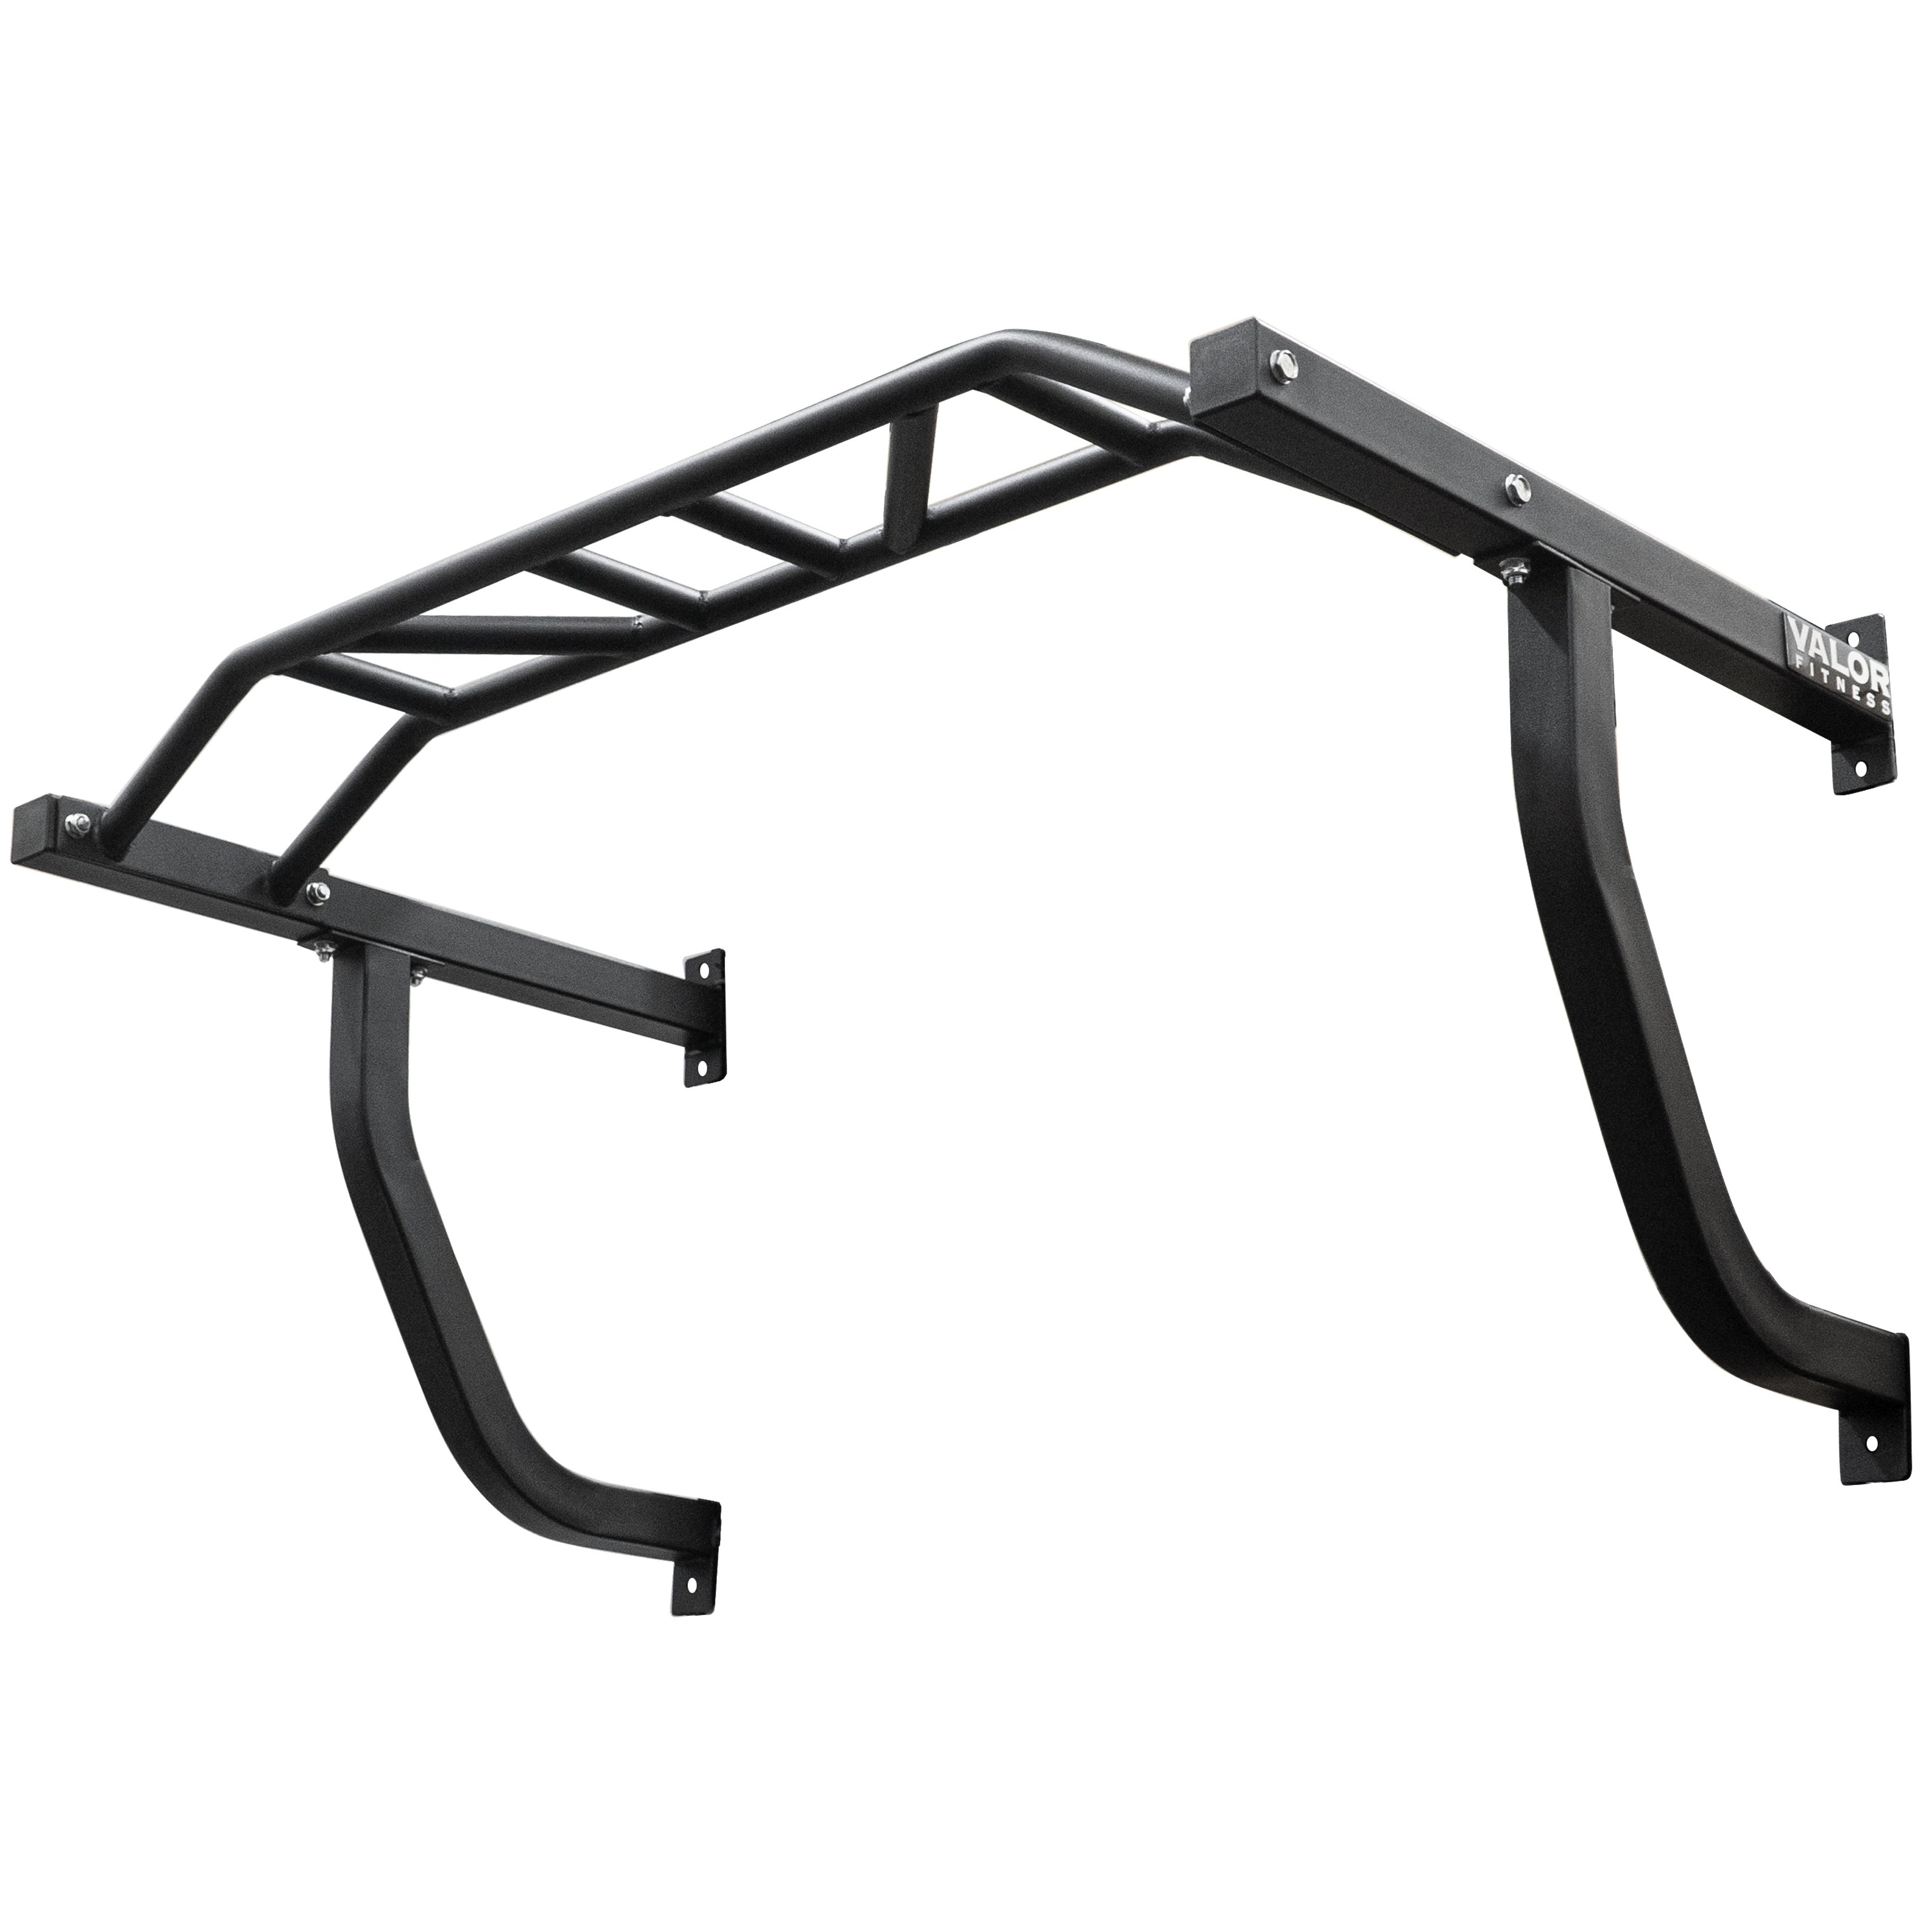 Valor Fitness Pro-style Mount Chin-up Bar (CHN-UP), Black